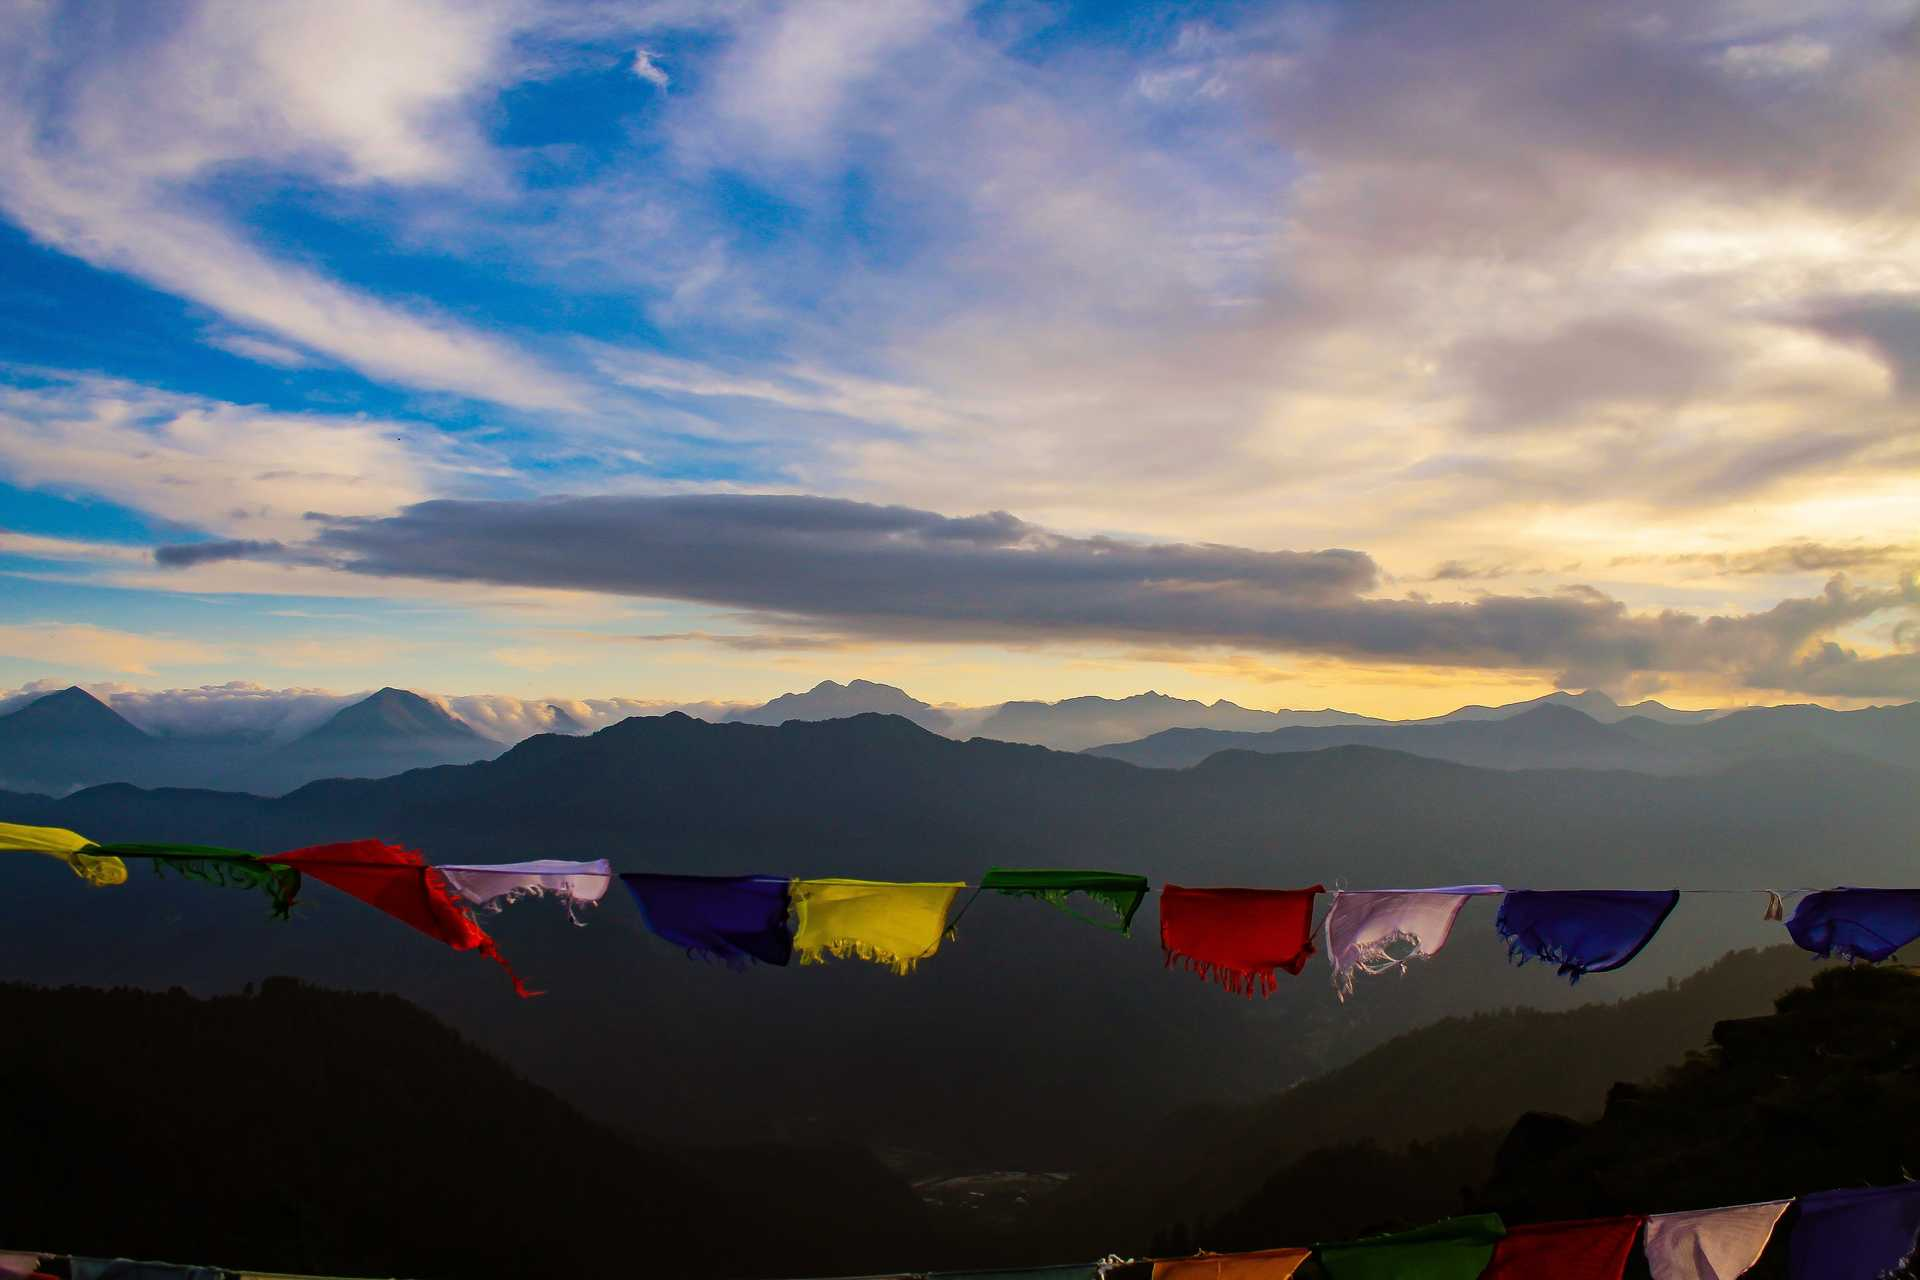 Prayer flags in Chele La Pass, Bhutan